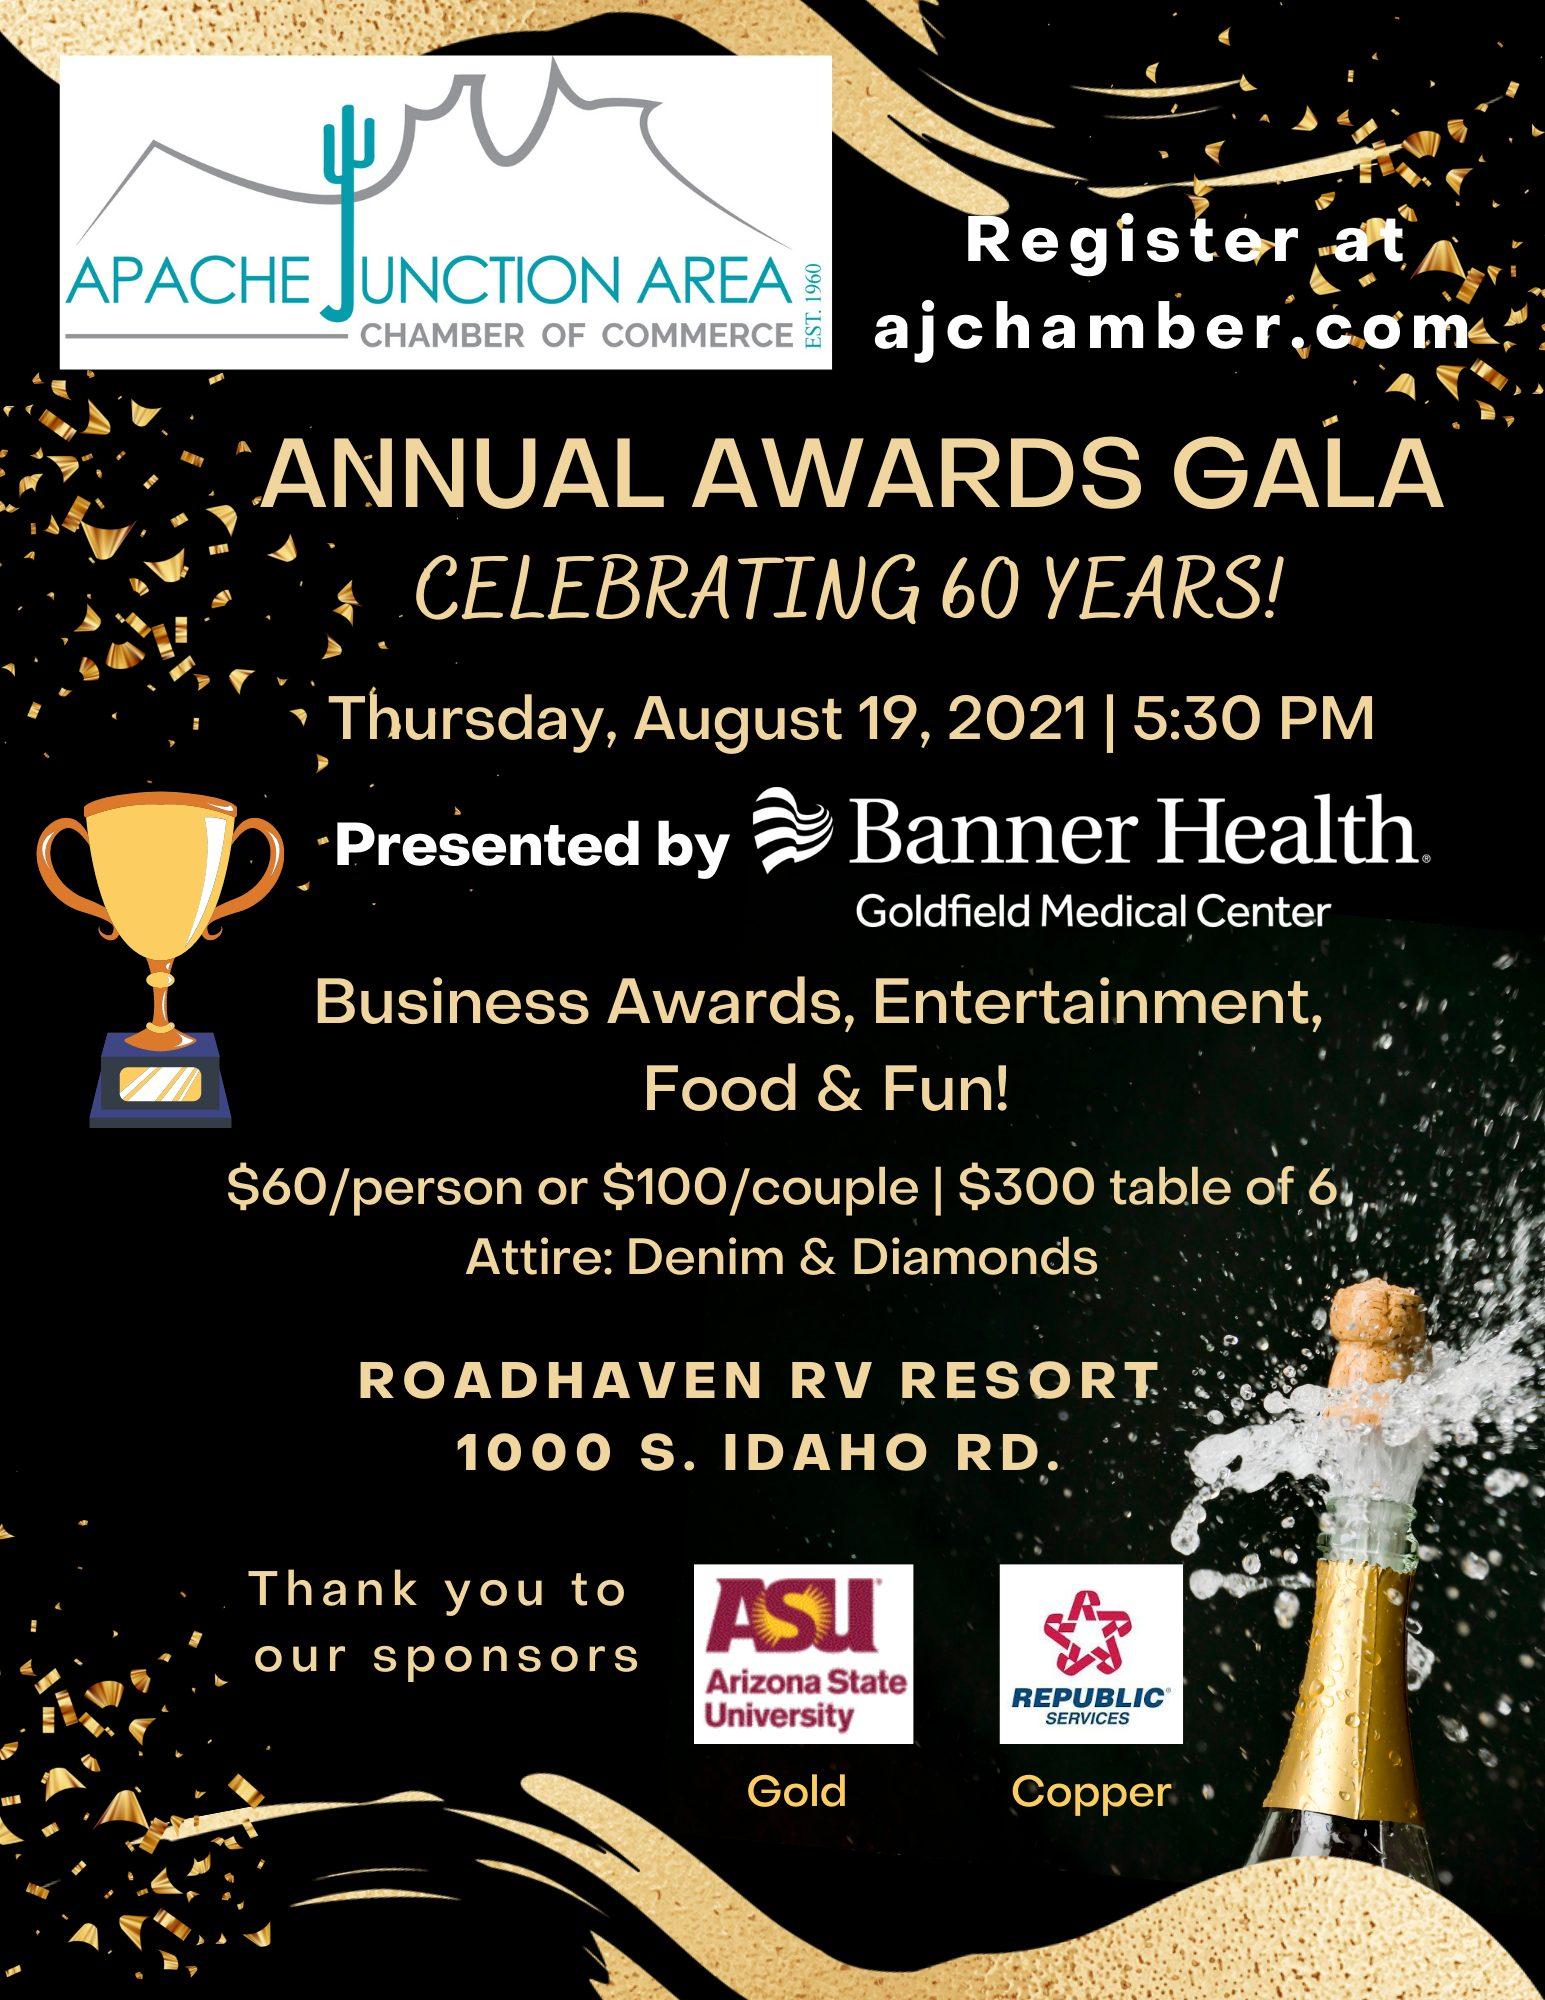 2021 Annual Awards Gala Flyer